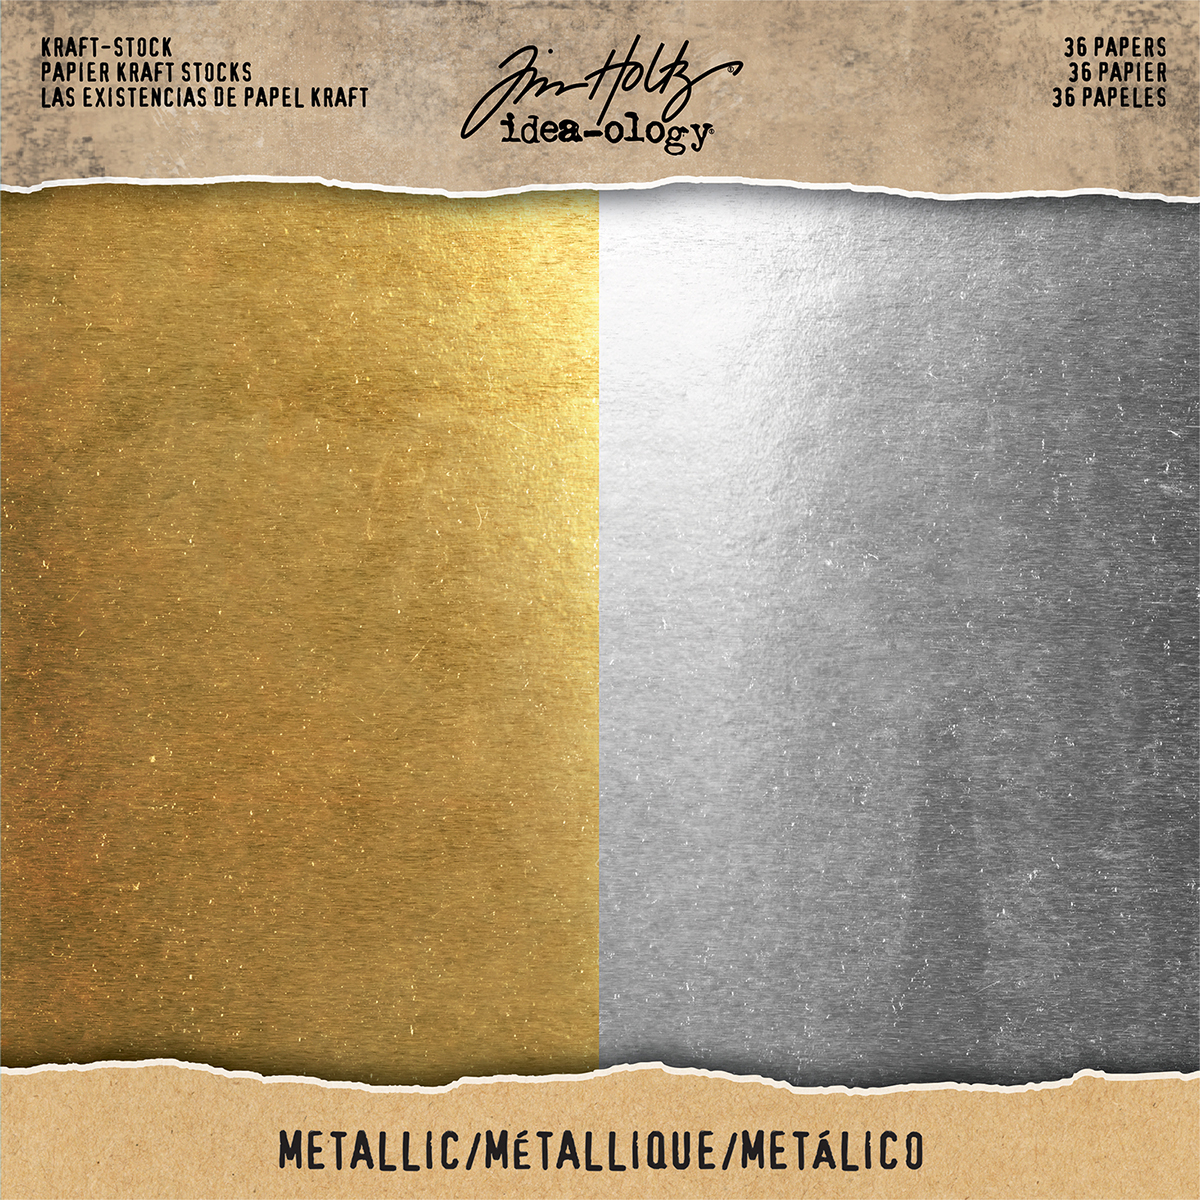 Kraft Stock Metallic Gold/Silver